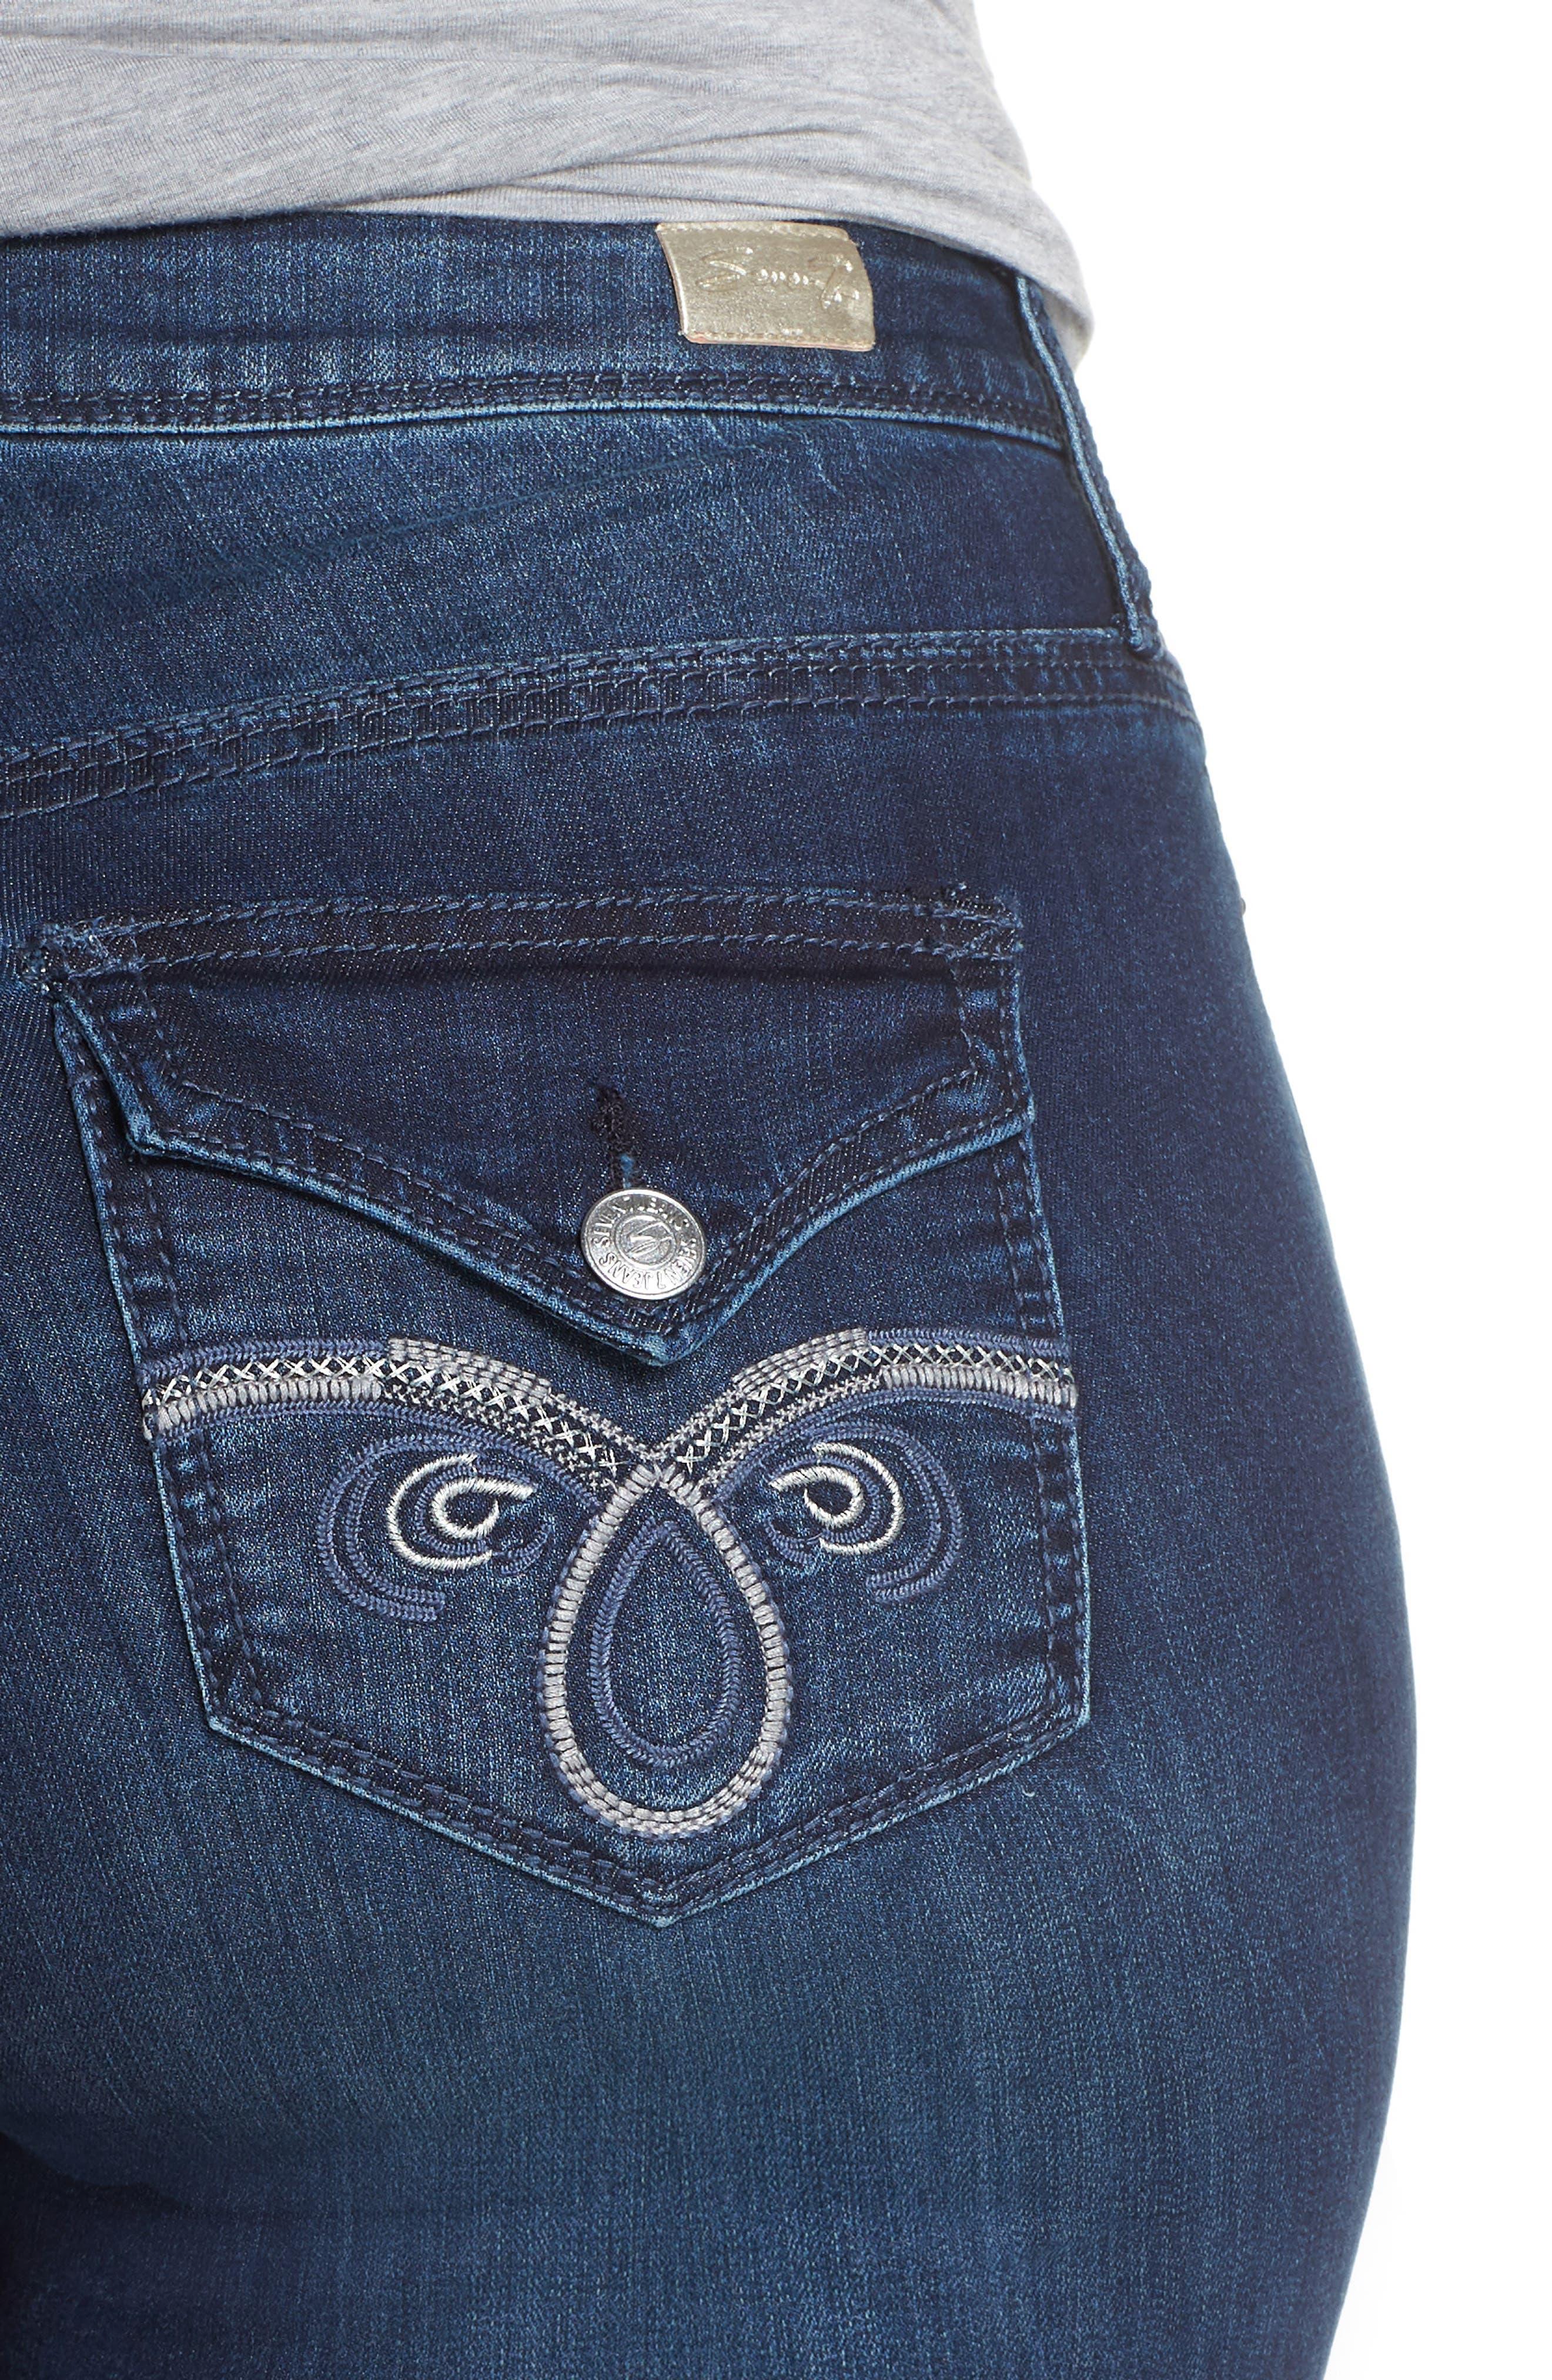 SEVEN7, Rocker Flap Pocket Slim Bootcut Jeans, Alternate thumbnail 5, color, CHALLENGER